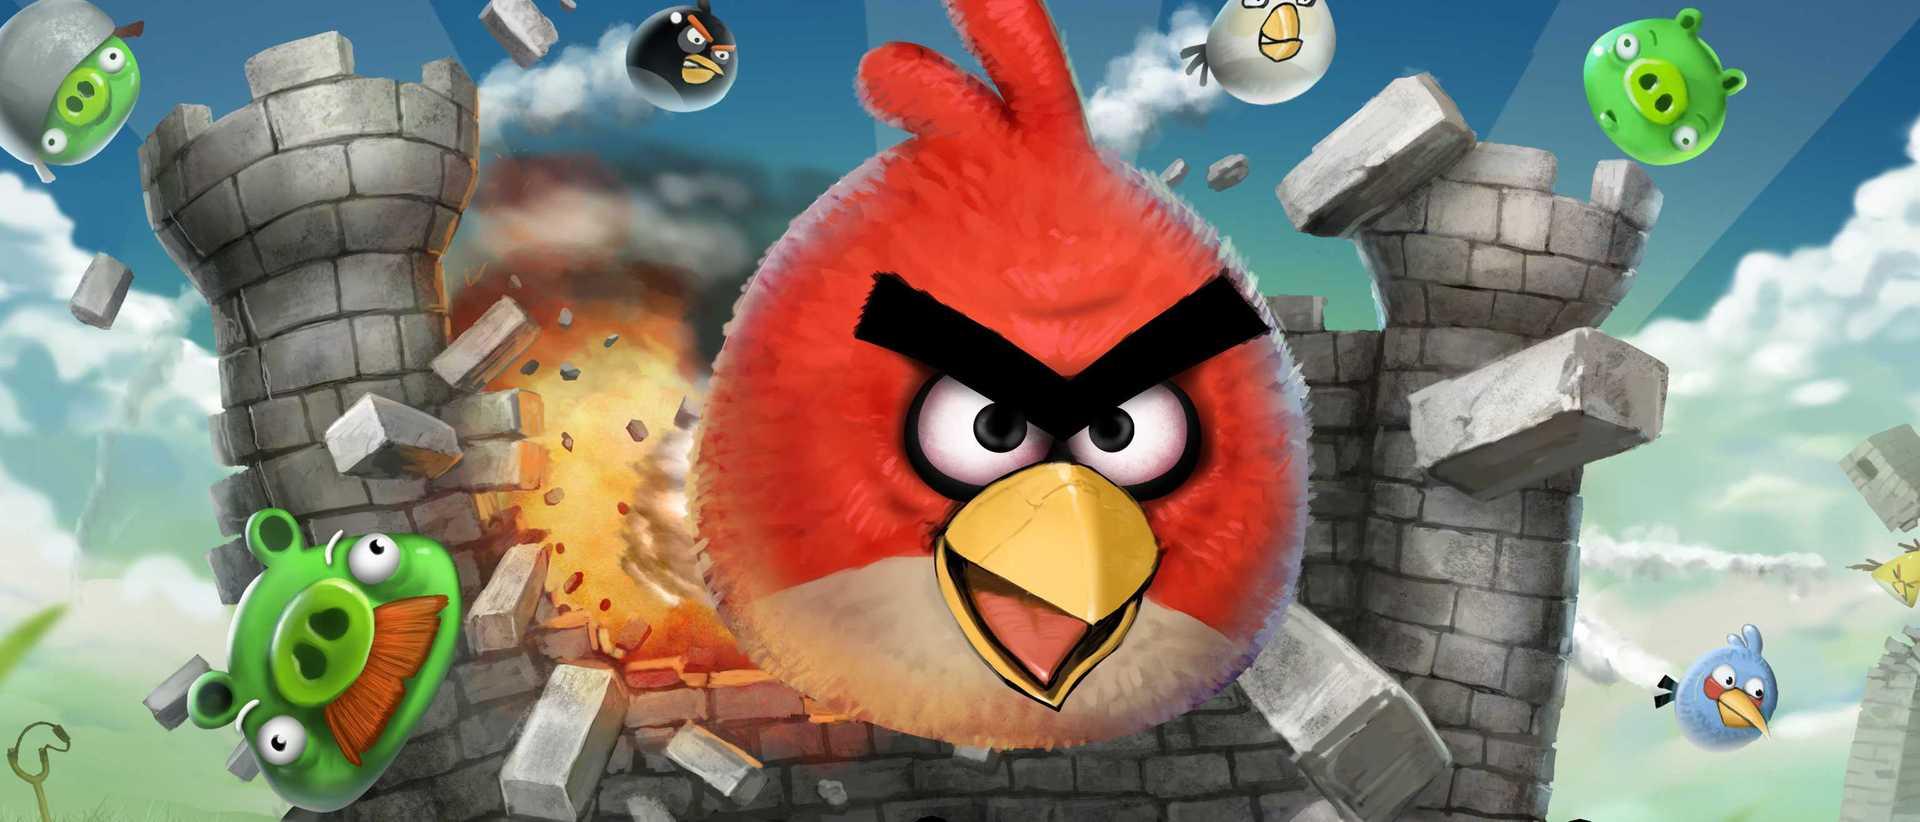 Angry Birds finalmente al cinema